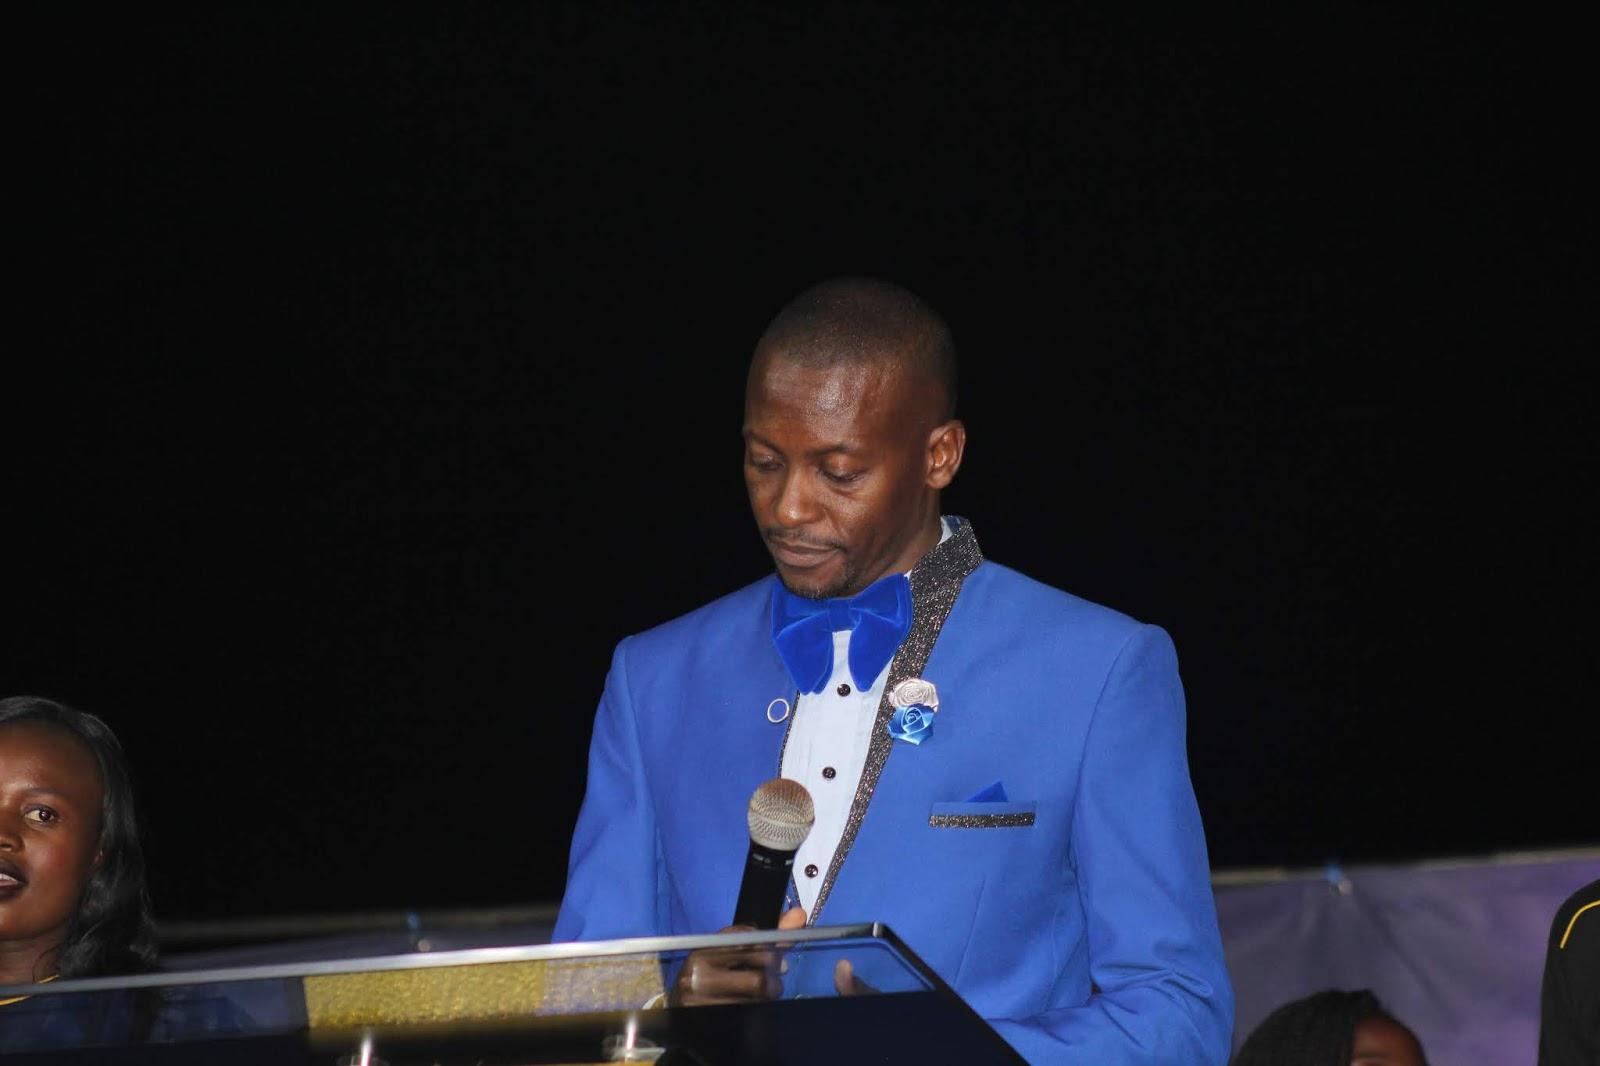 Testimonial About Apostle Pride Sibiya On His Birthday By Emily Mudzimba